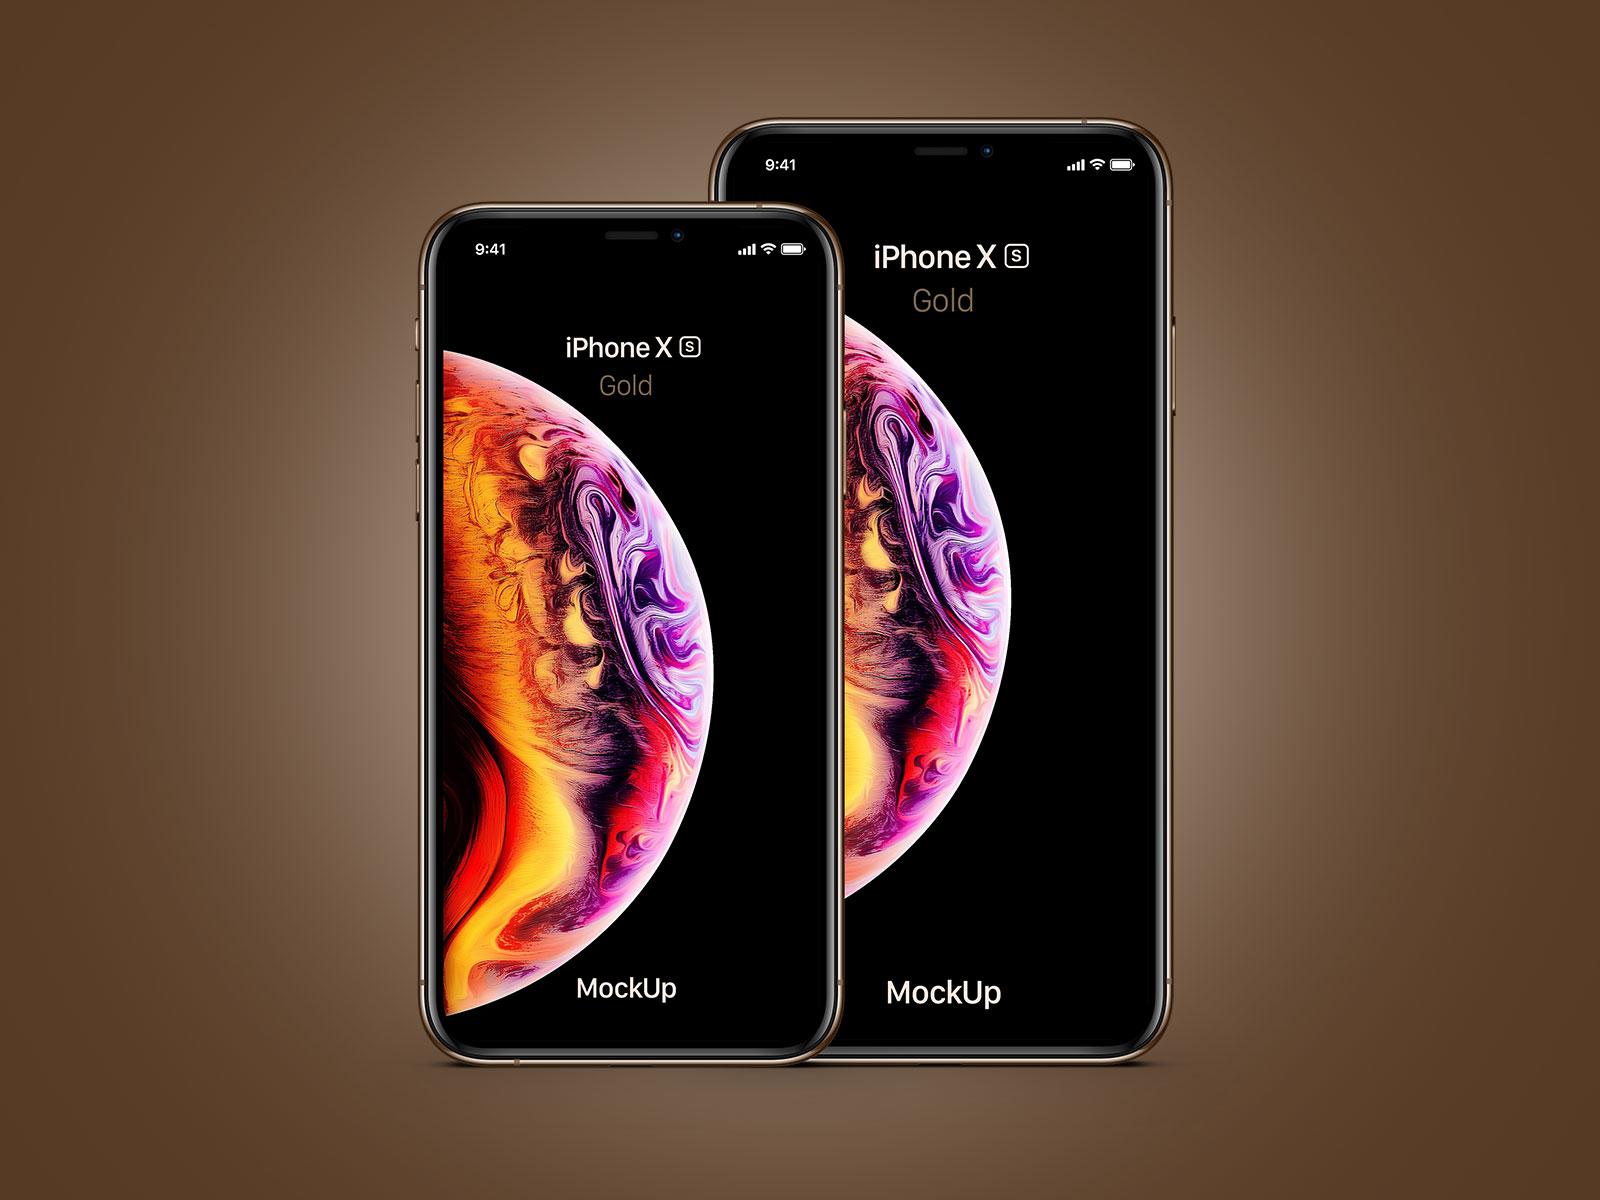 Free-iPhone-Xs-&-Xs-Max-Gold-Mockup-PSD